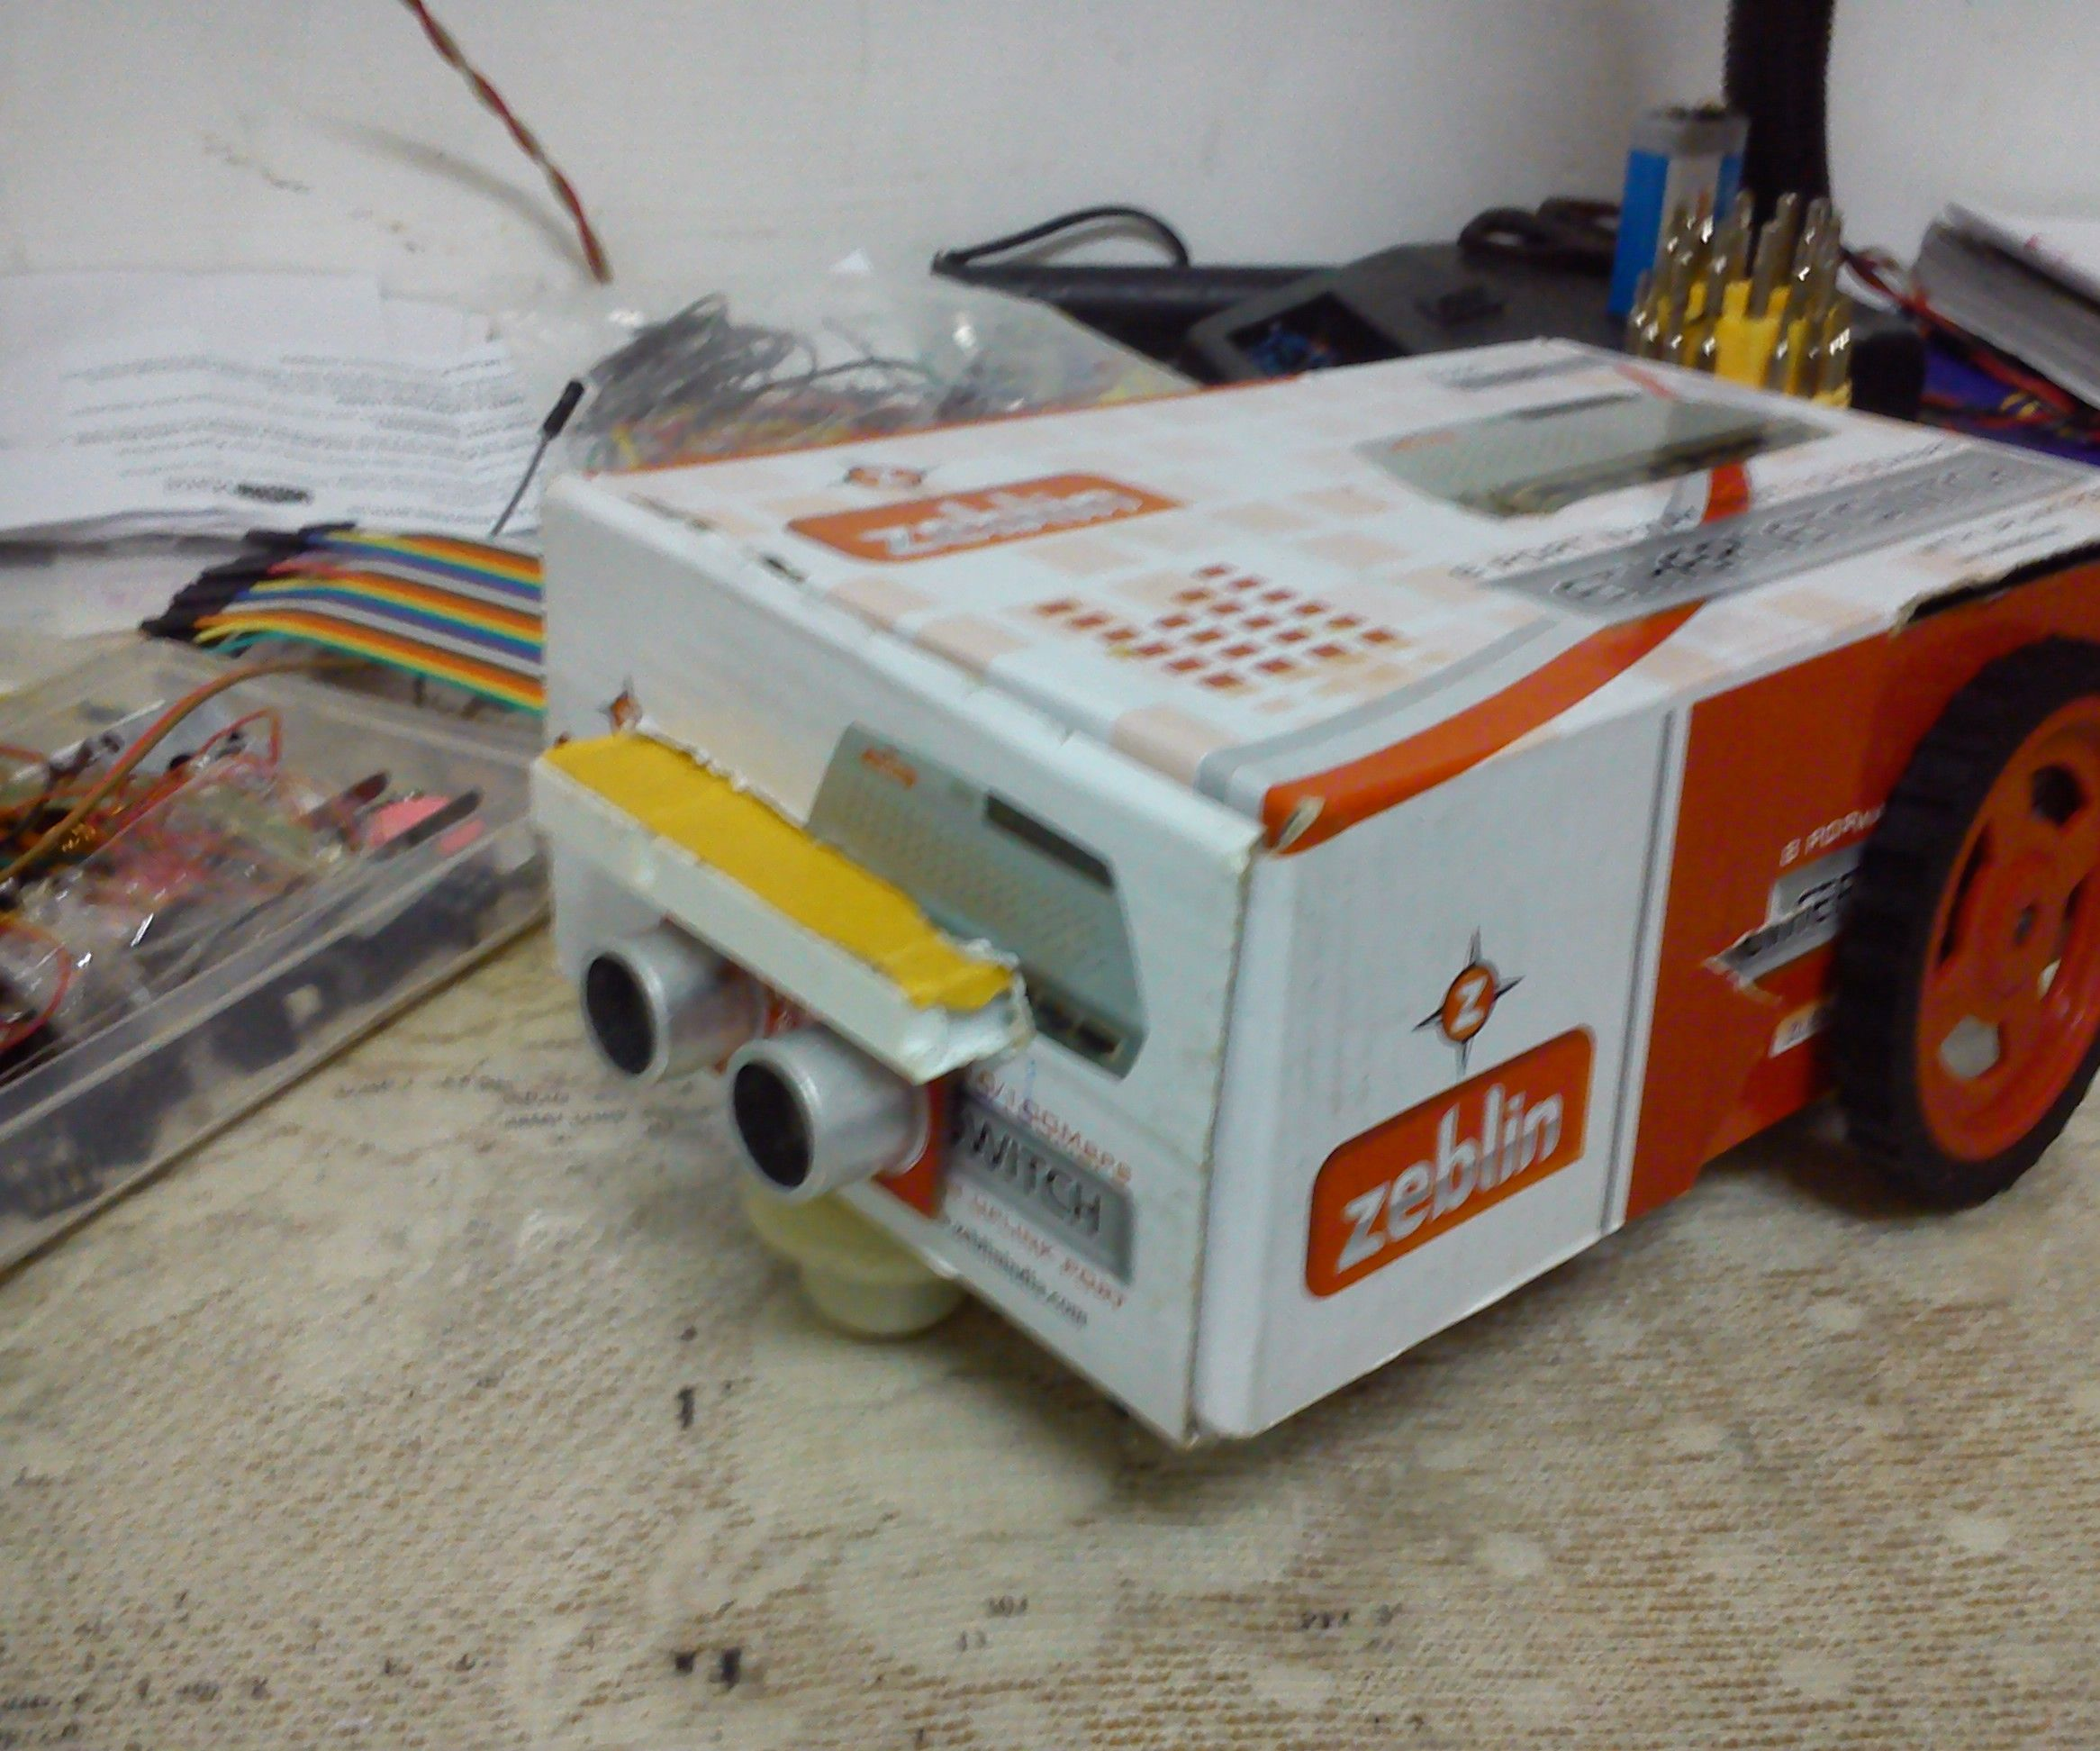 DUAL MODE ROBOT => (AUTONOMOUS / MANUAL CONTROL)